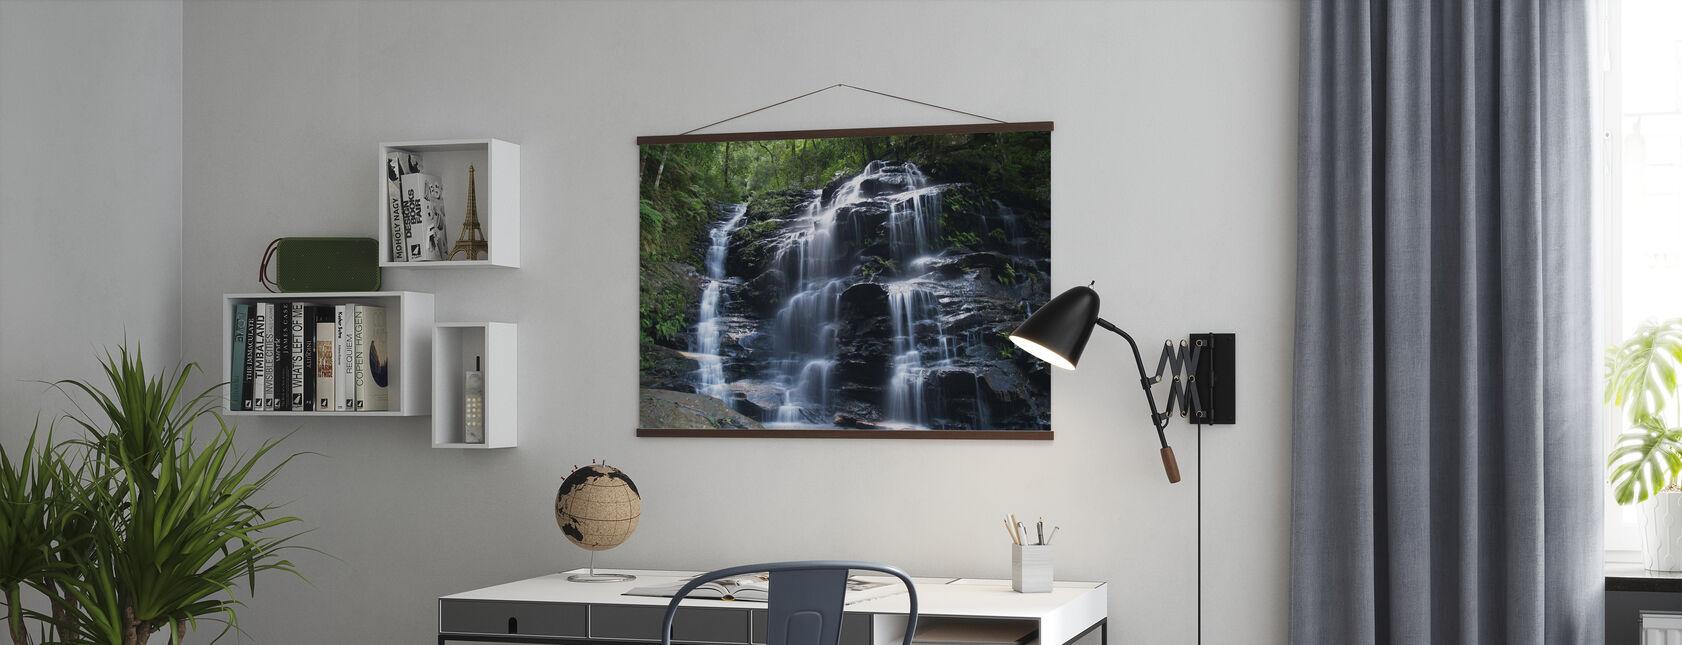 Amazon Waterfall - Poster - Office